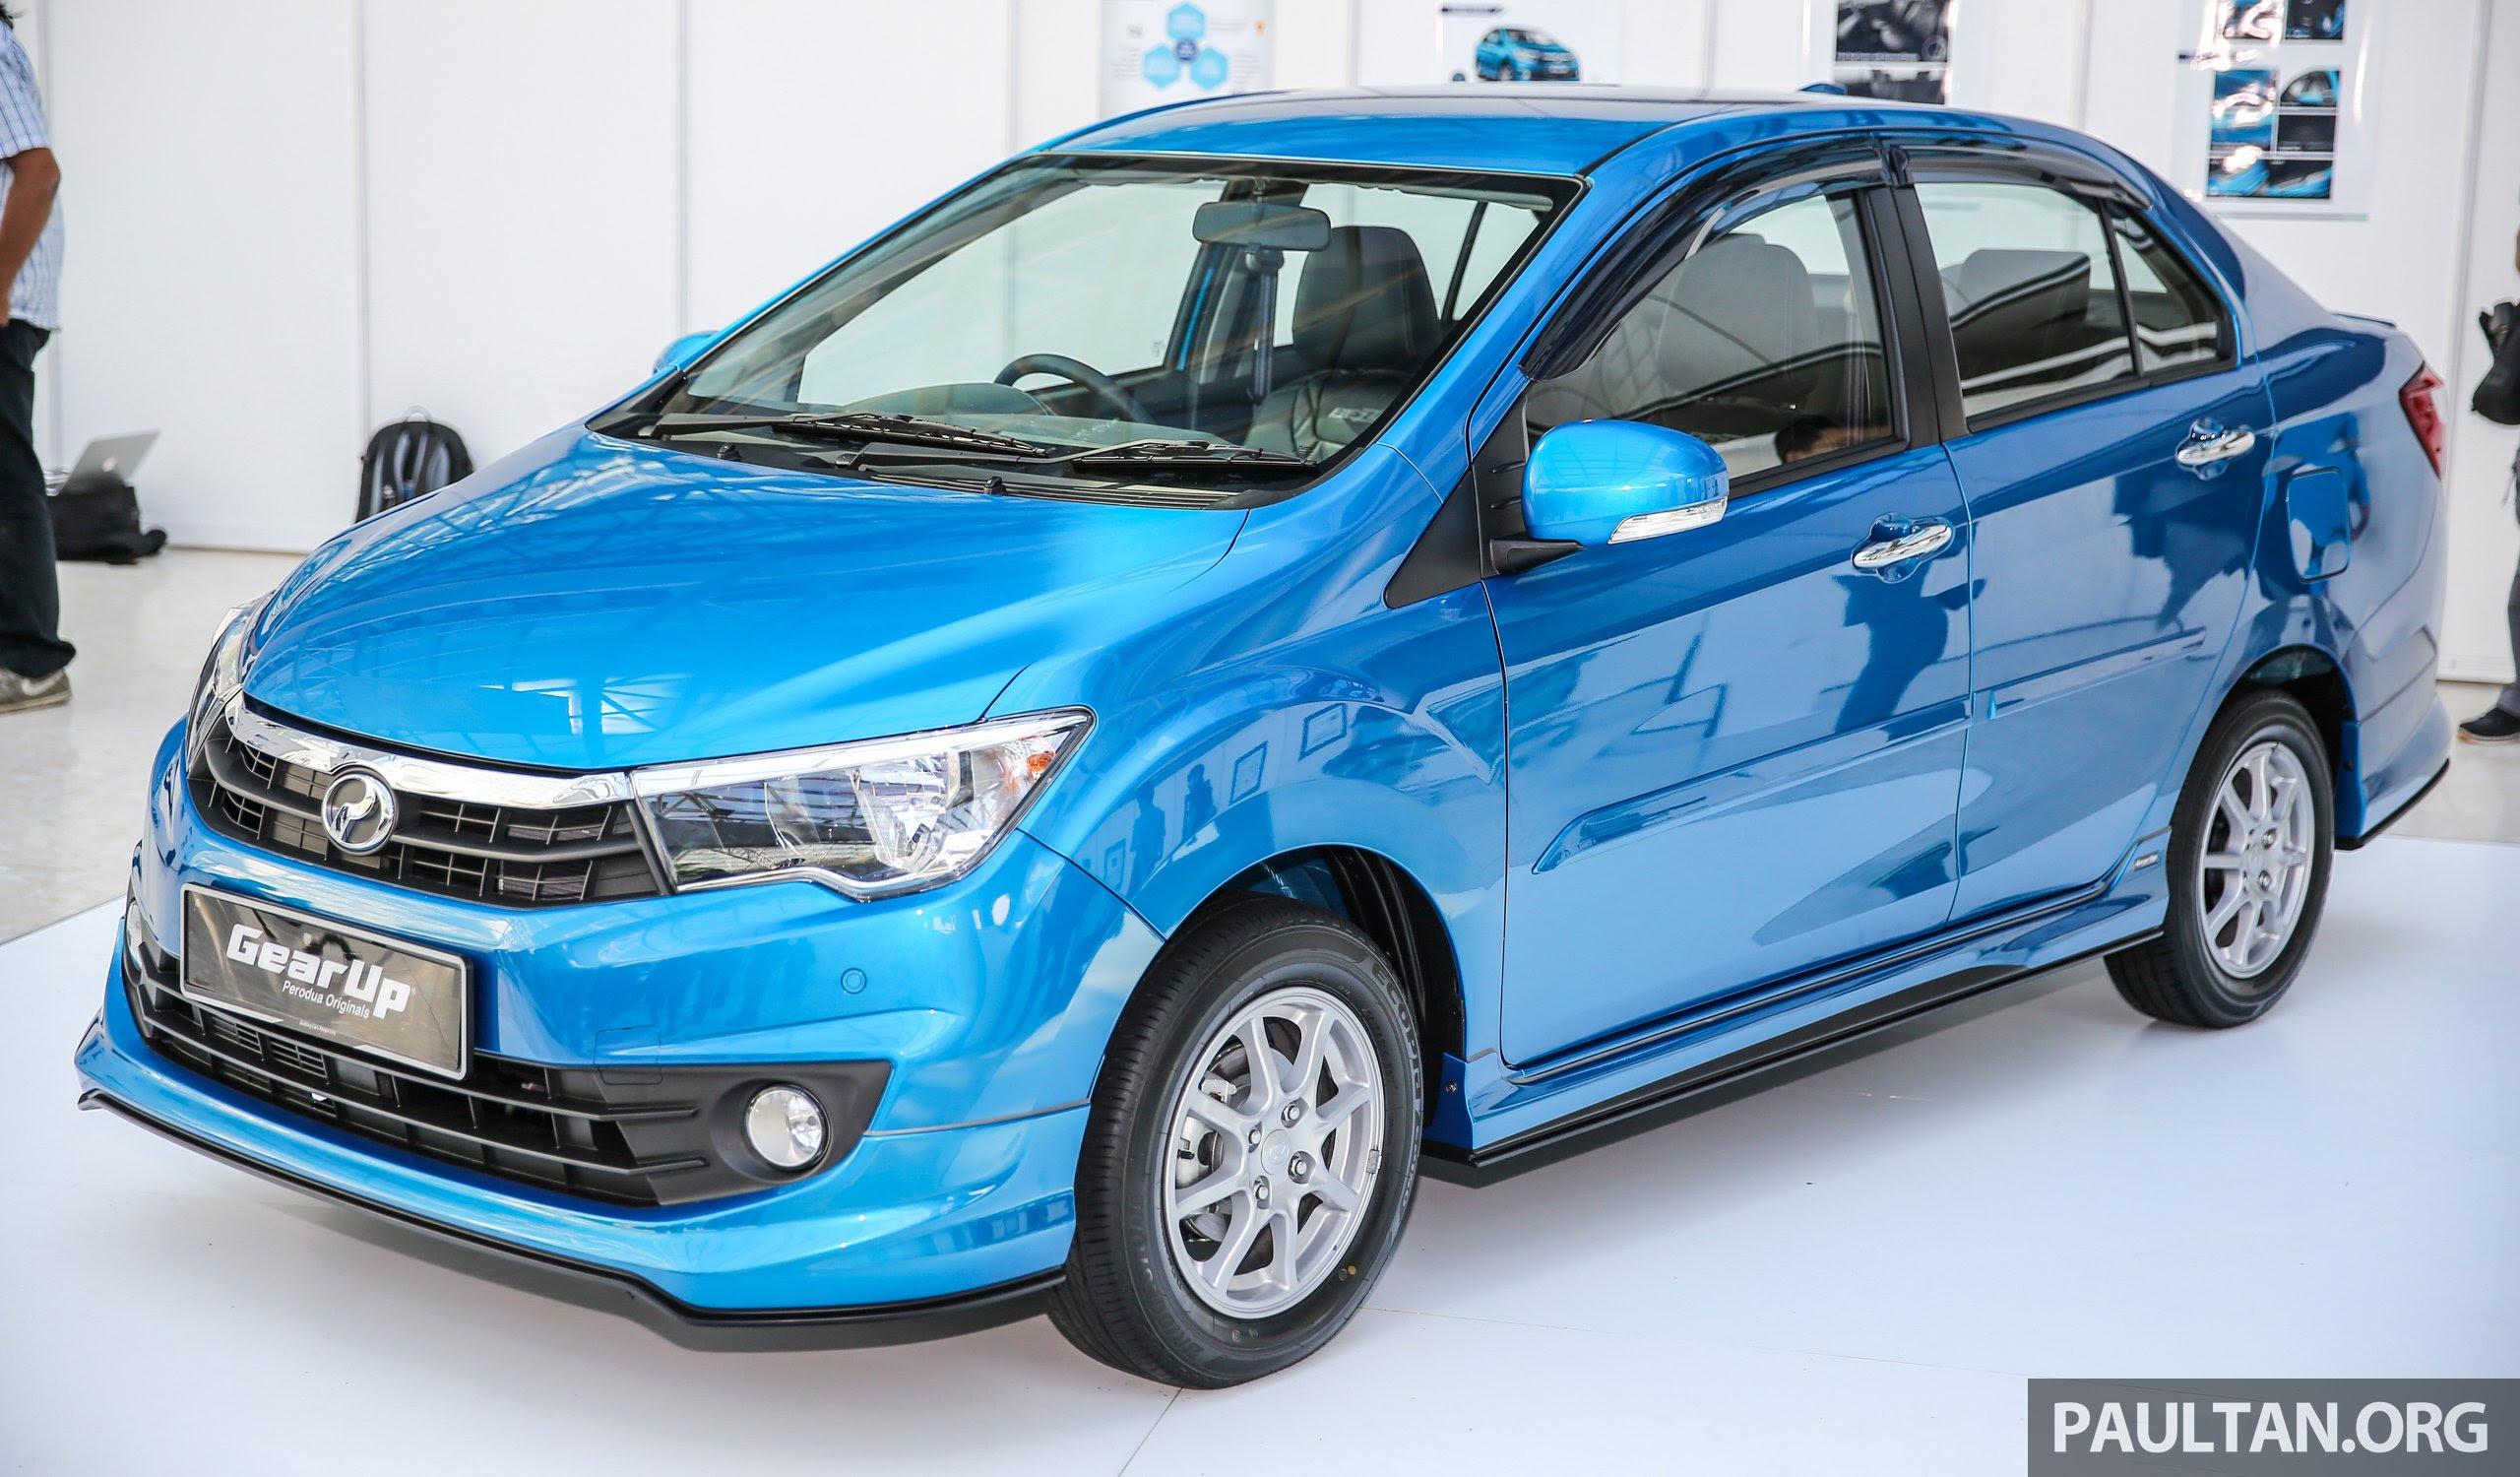 Perodua Bezza tops Trending Car Models list in Google's